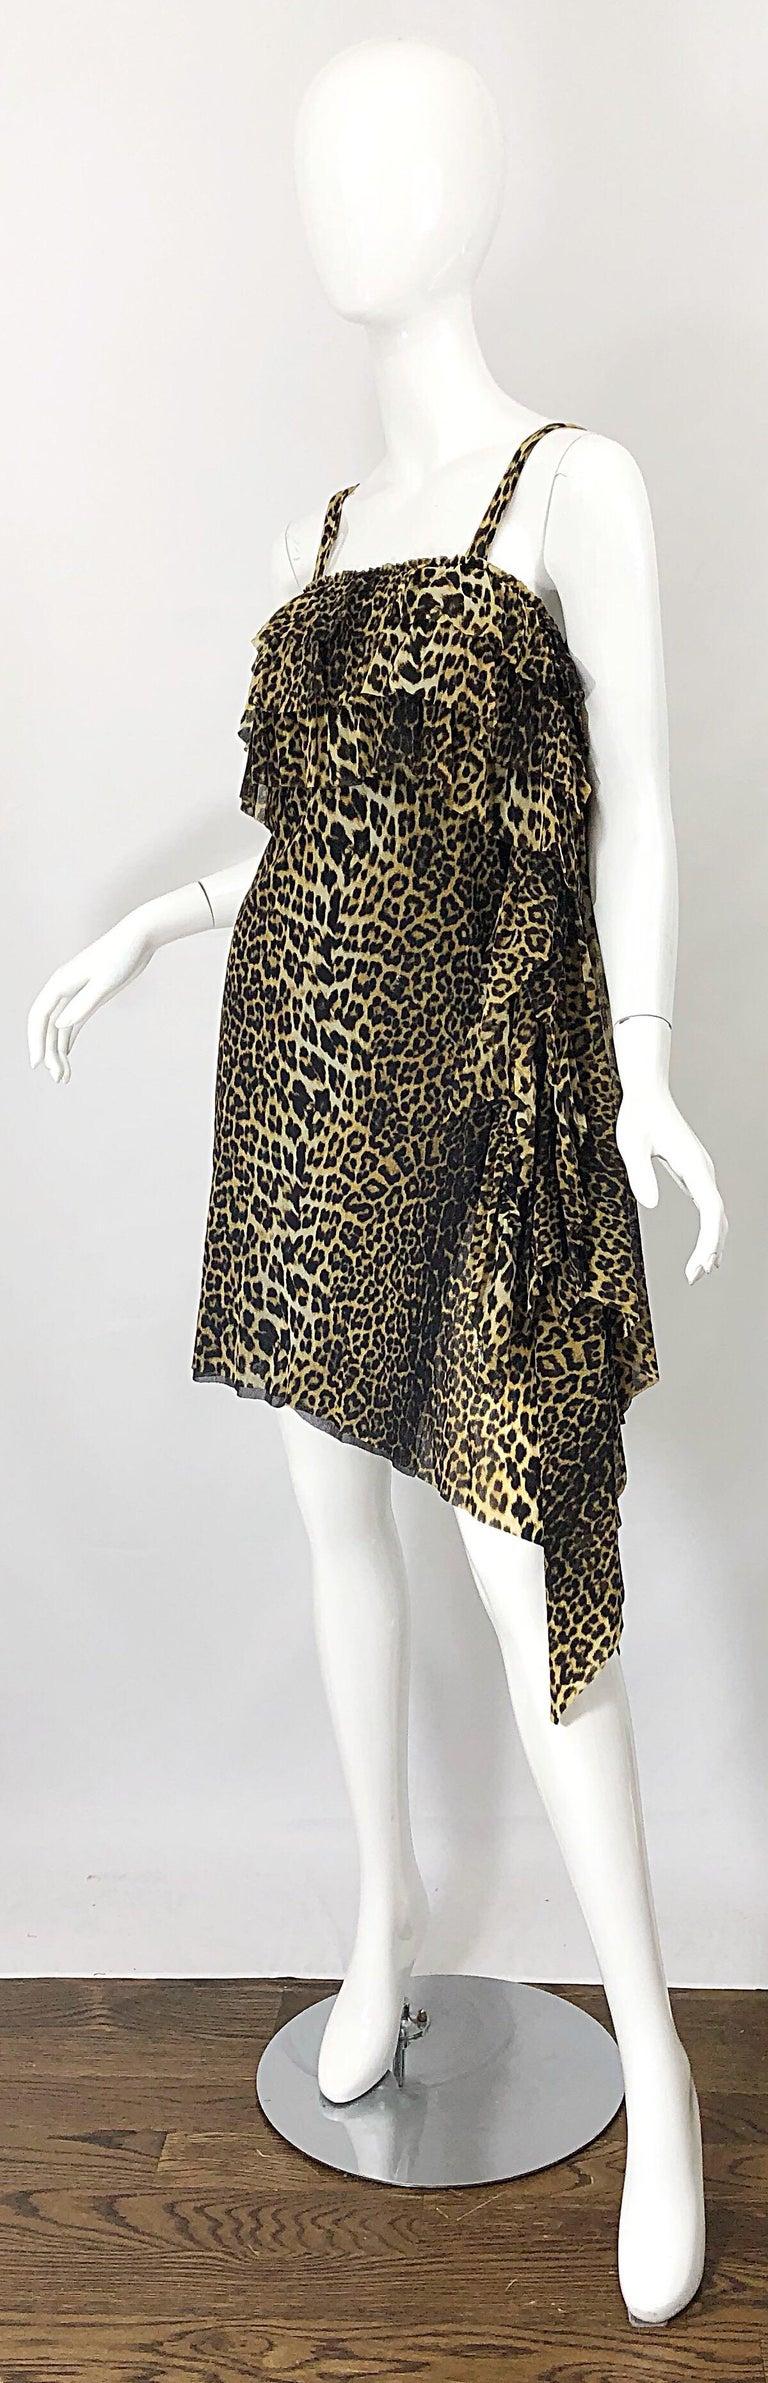 Vintage Jean Paul Gaultier 1990s Leopard Cheetah Animal Print 90s Sash Dress For Sale 4